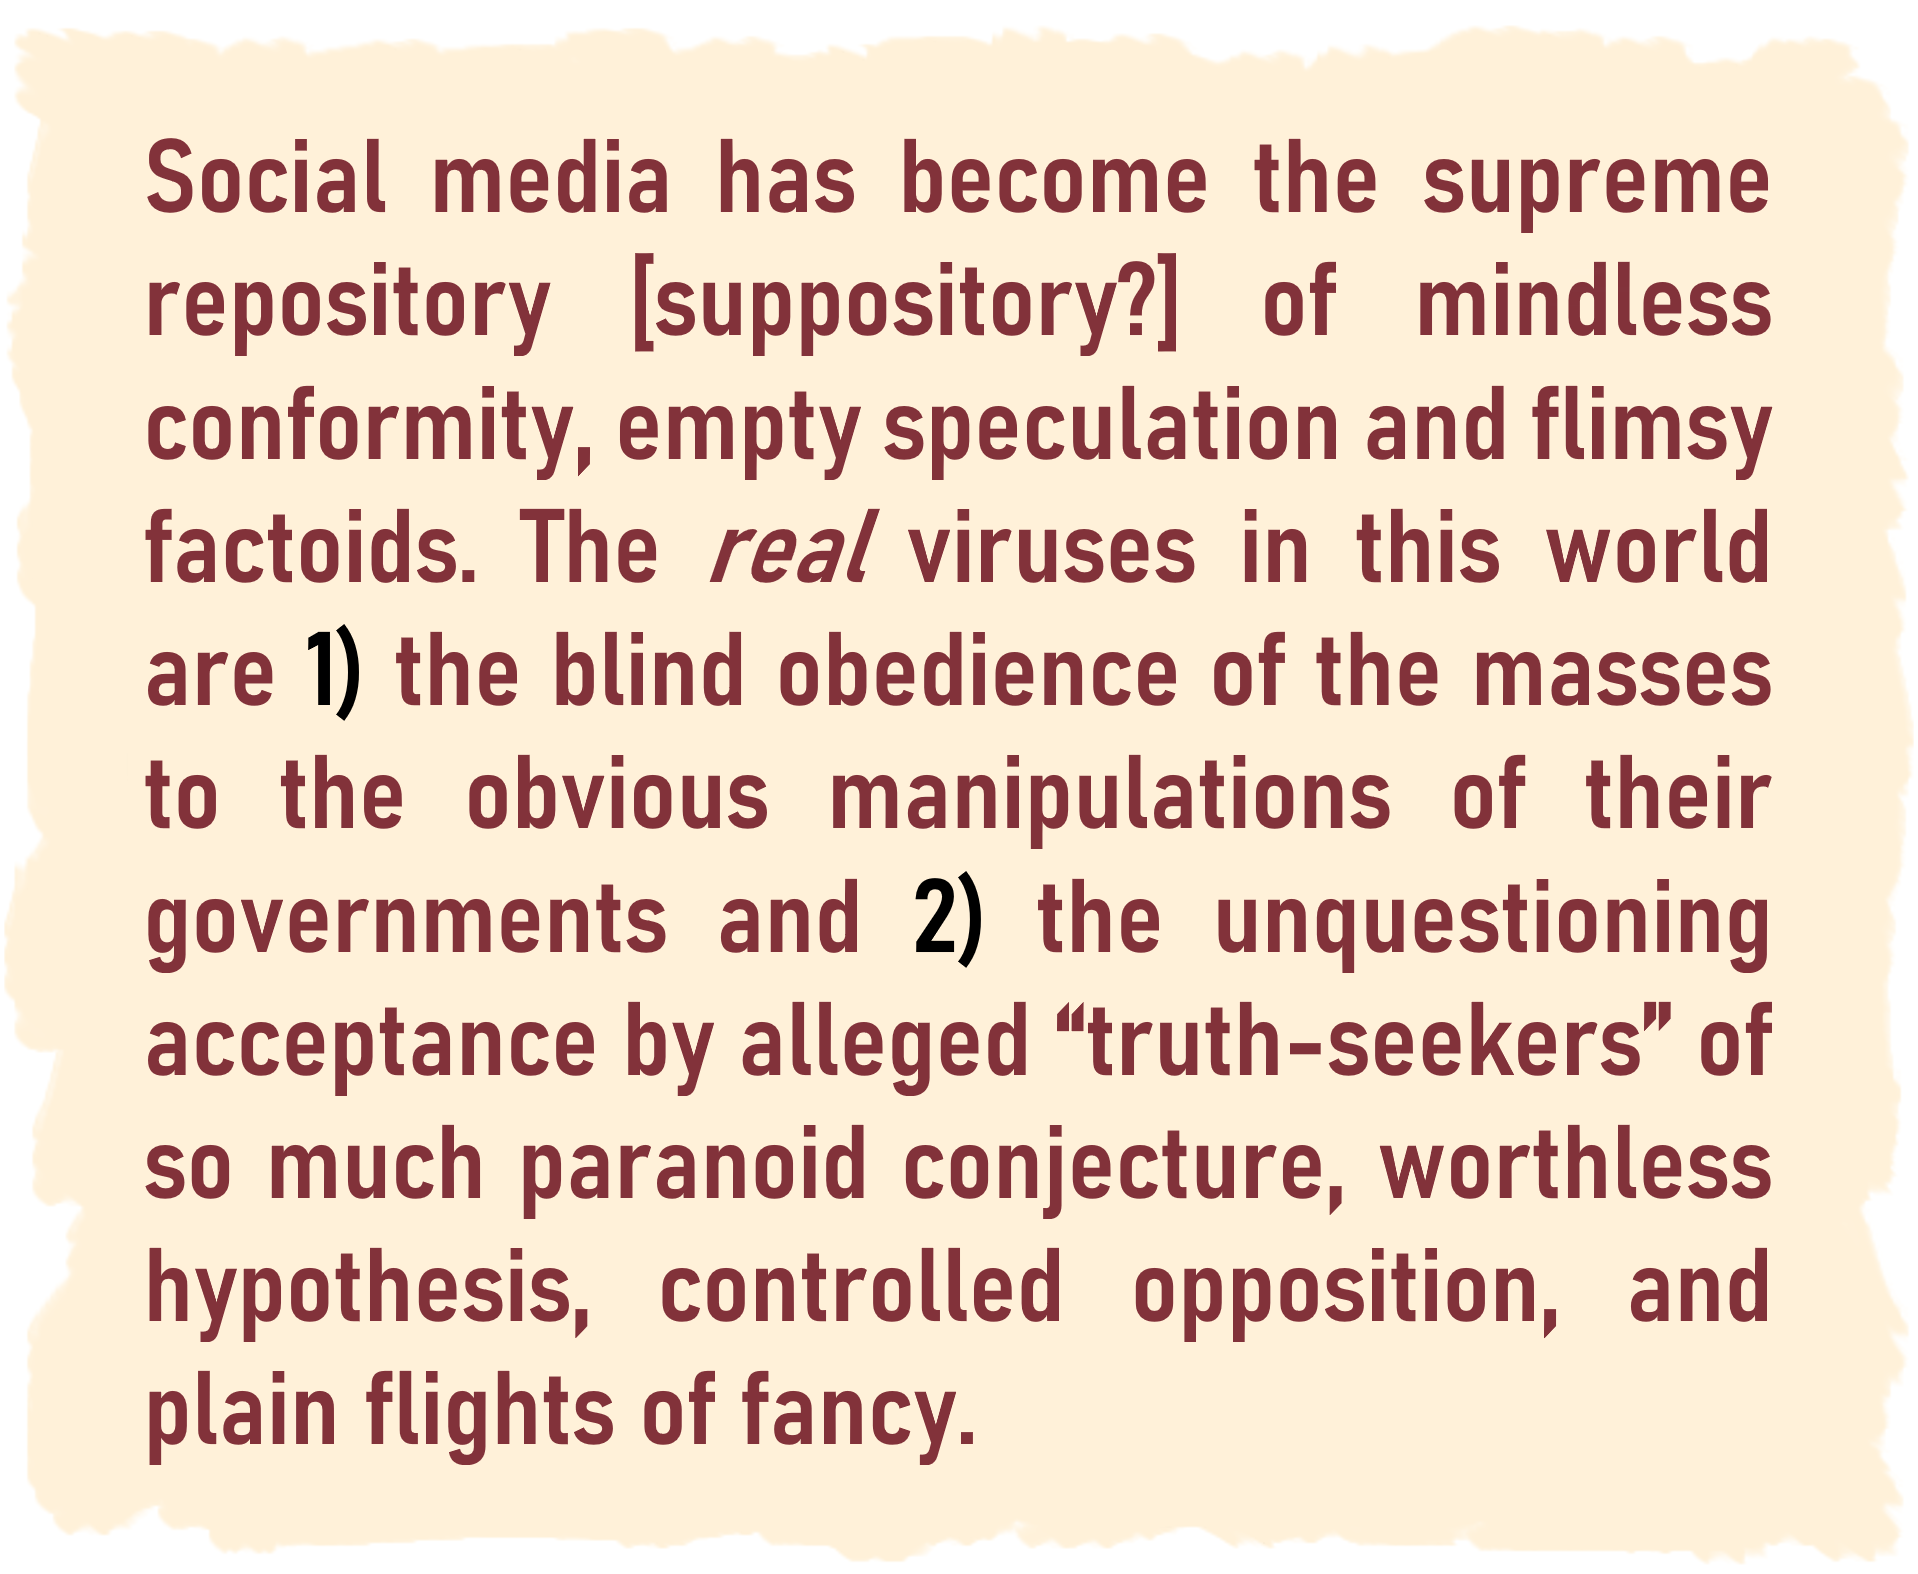 Social Media Suppository